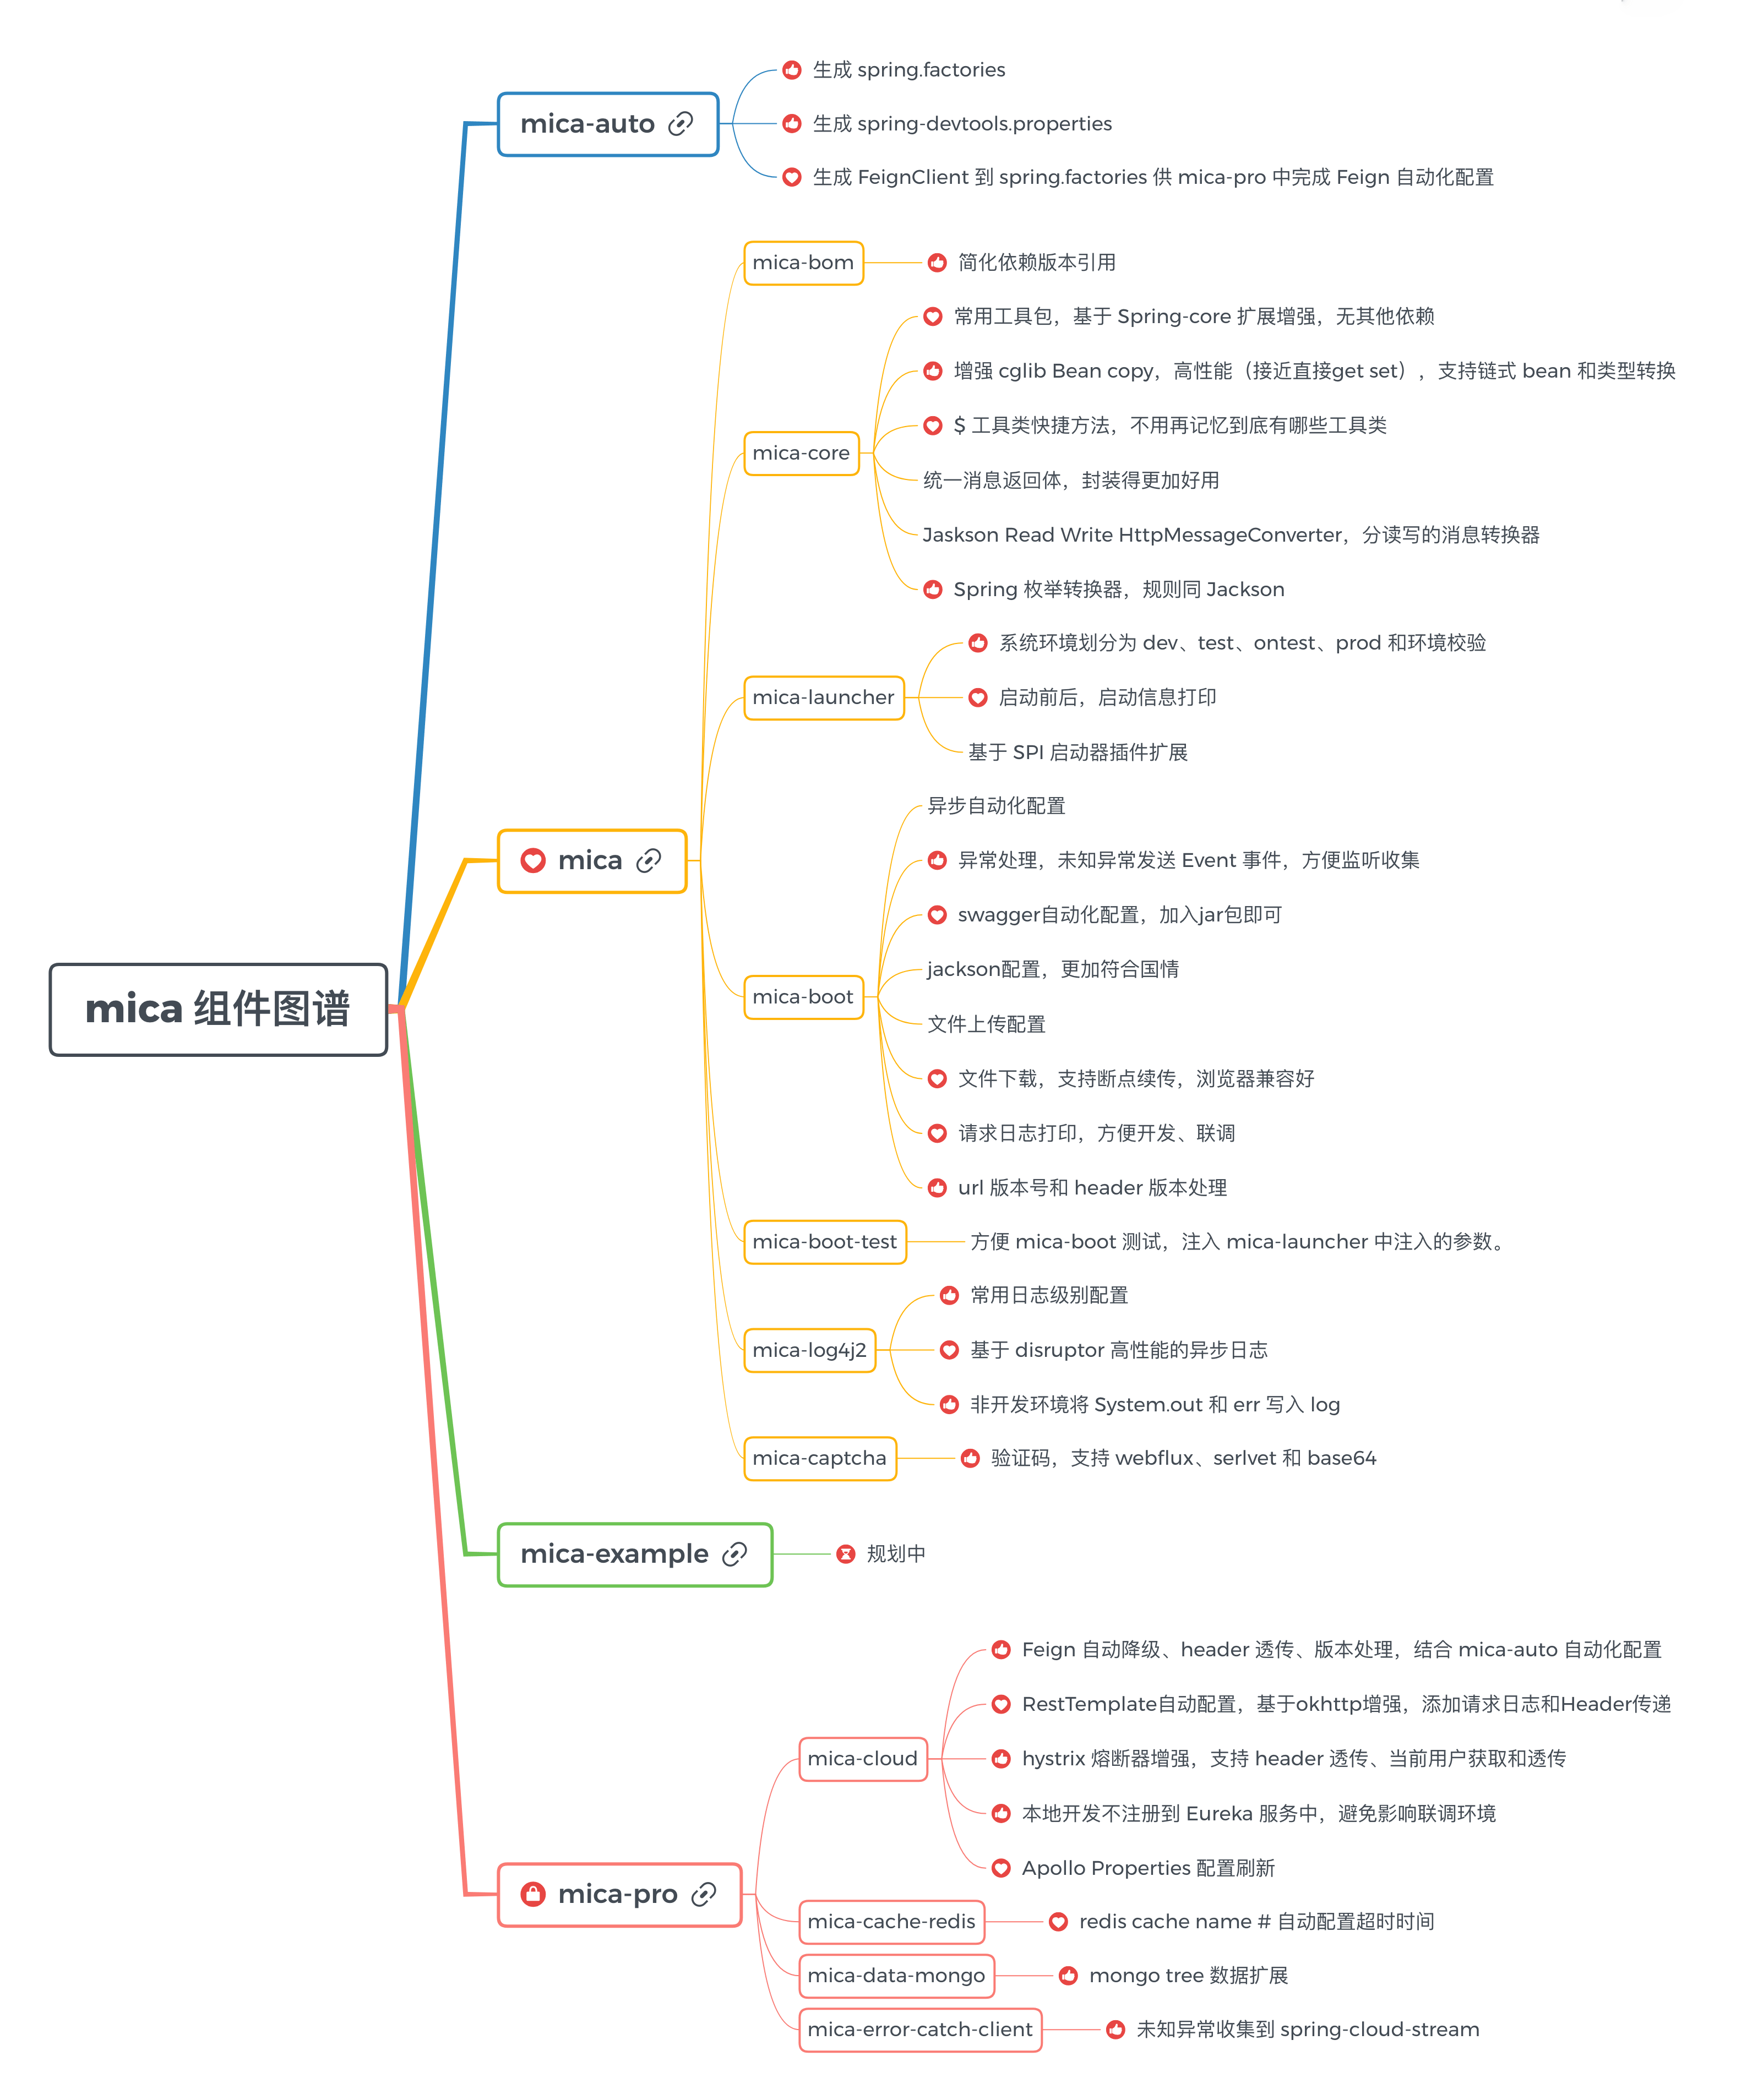 mica软件图谱